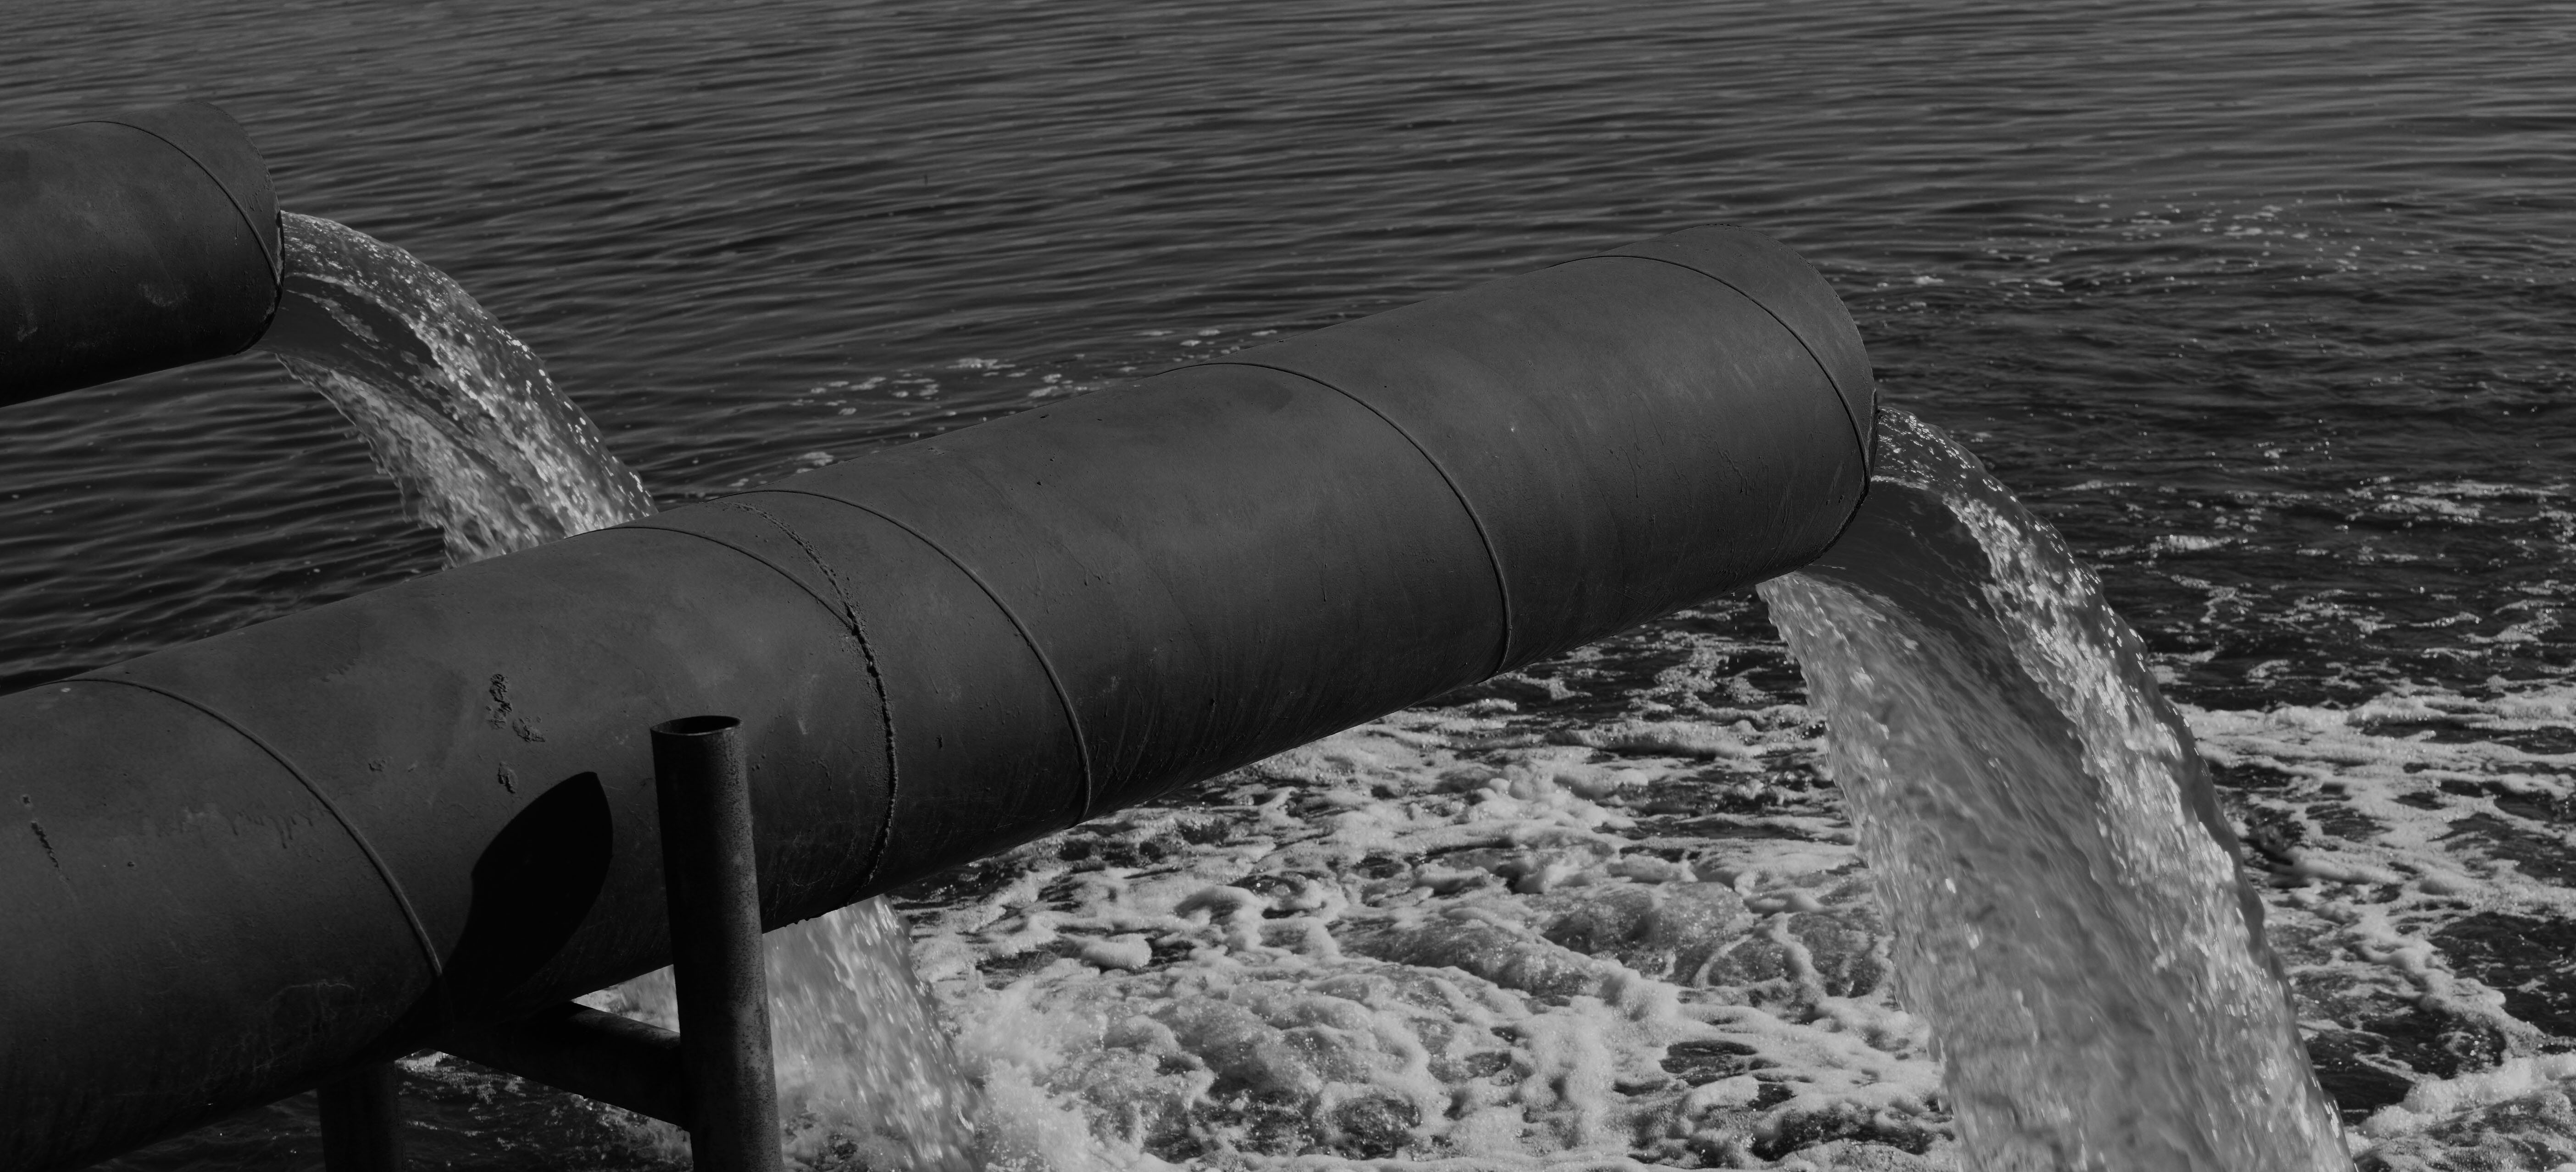 industrial-waste-discharge-2980832